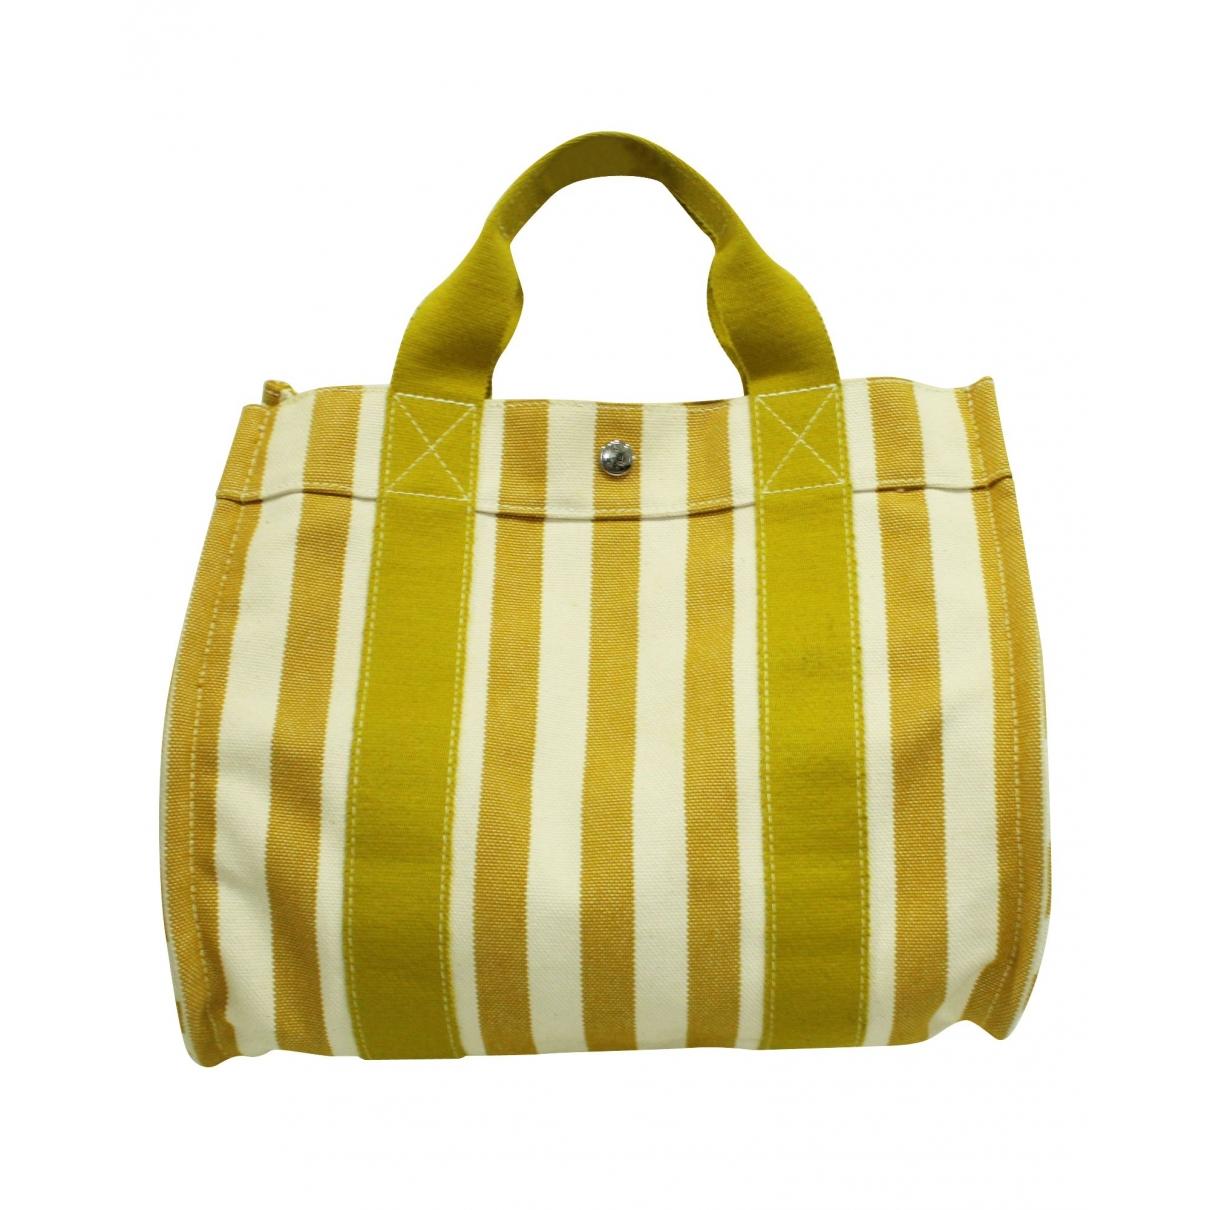 Hermès \N Yellow Cotton handbag for Women \N